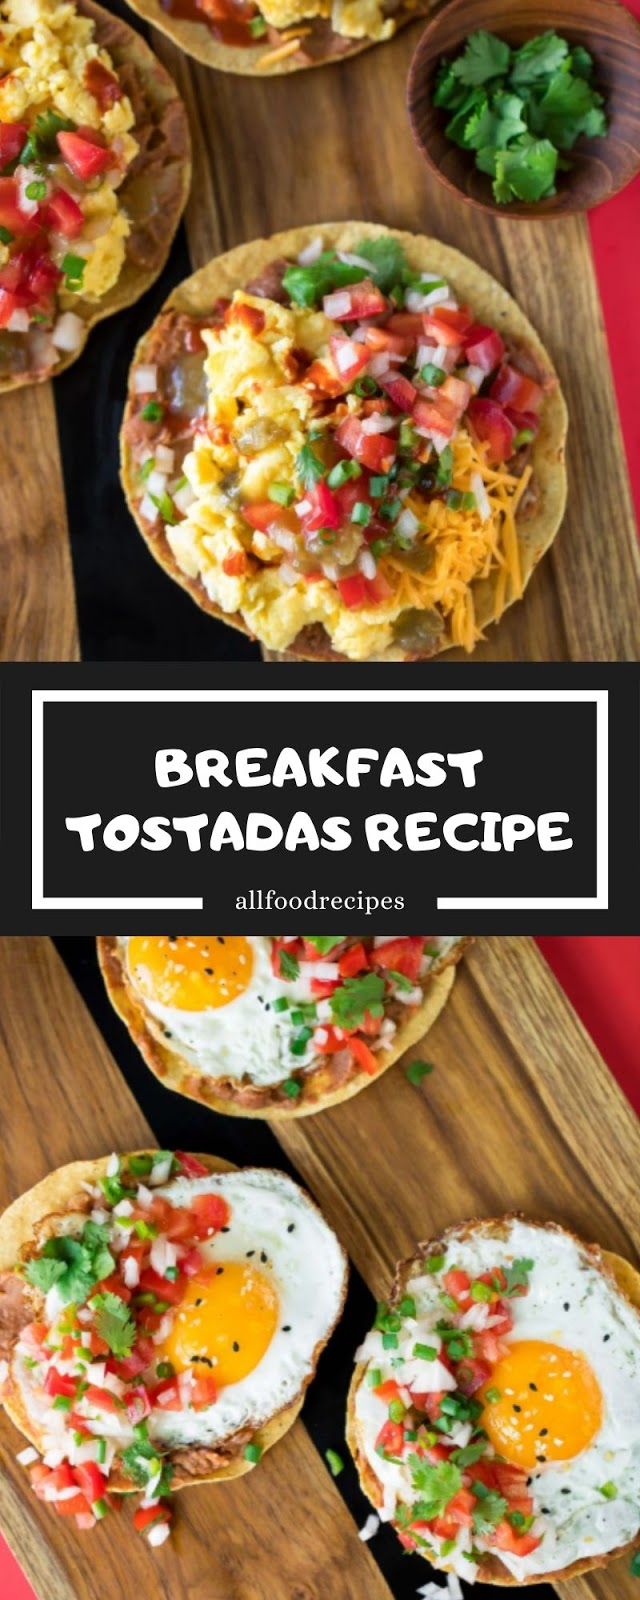 BREAKFAST TOSTADAS RECIPE